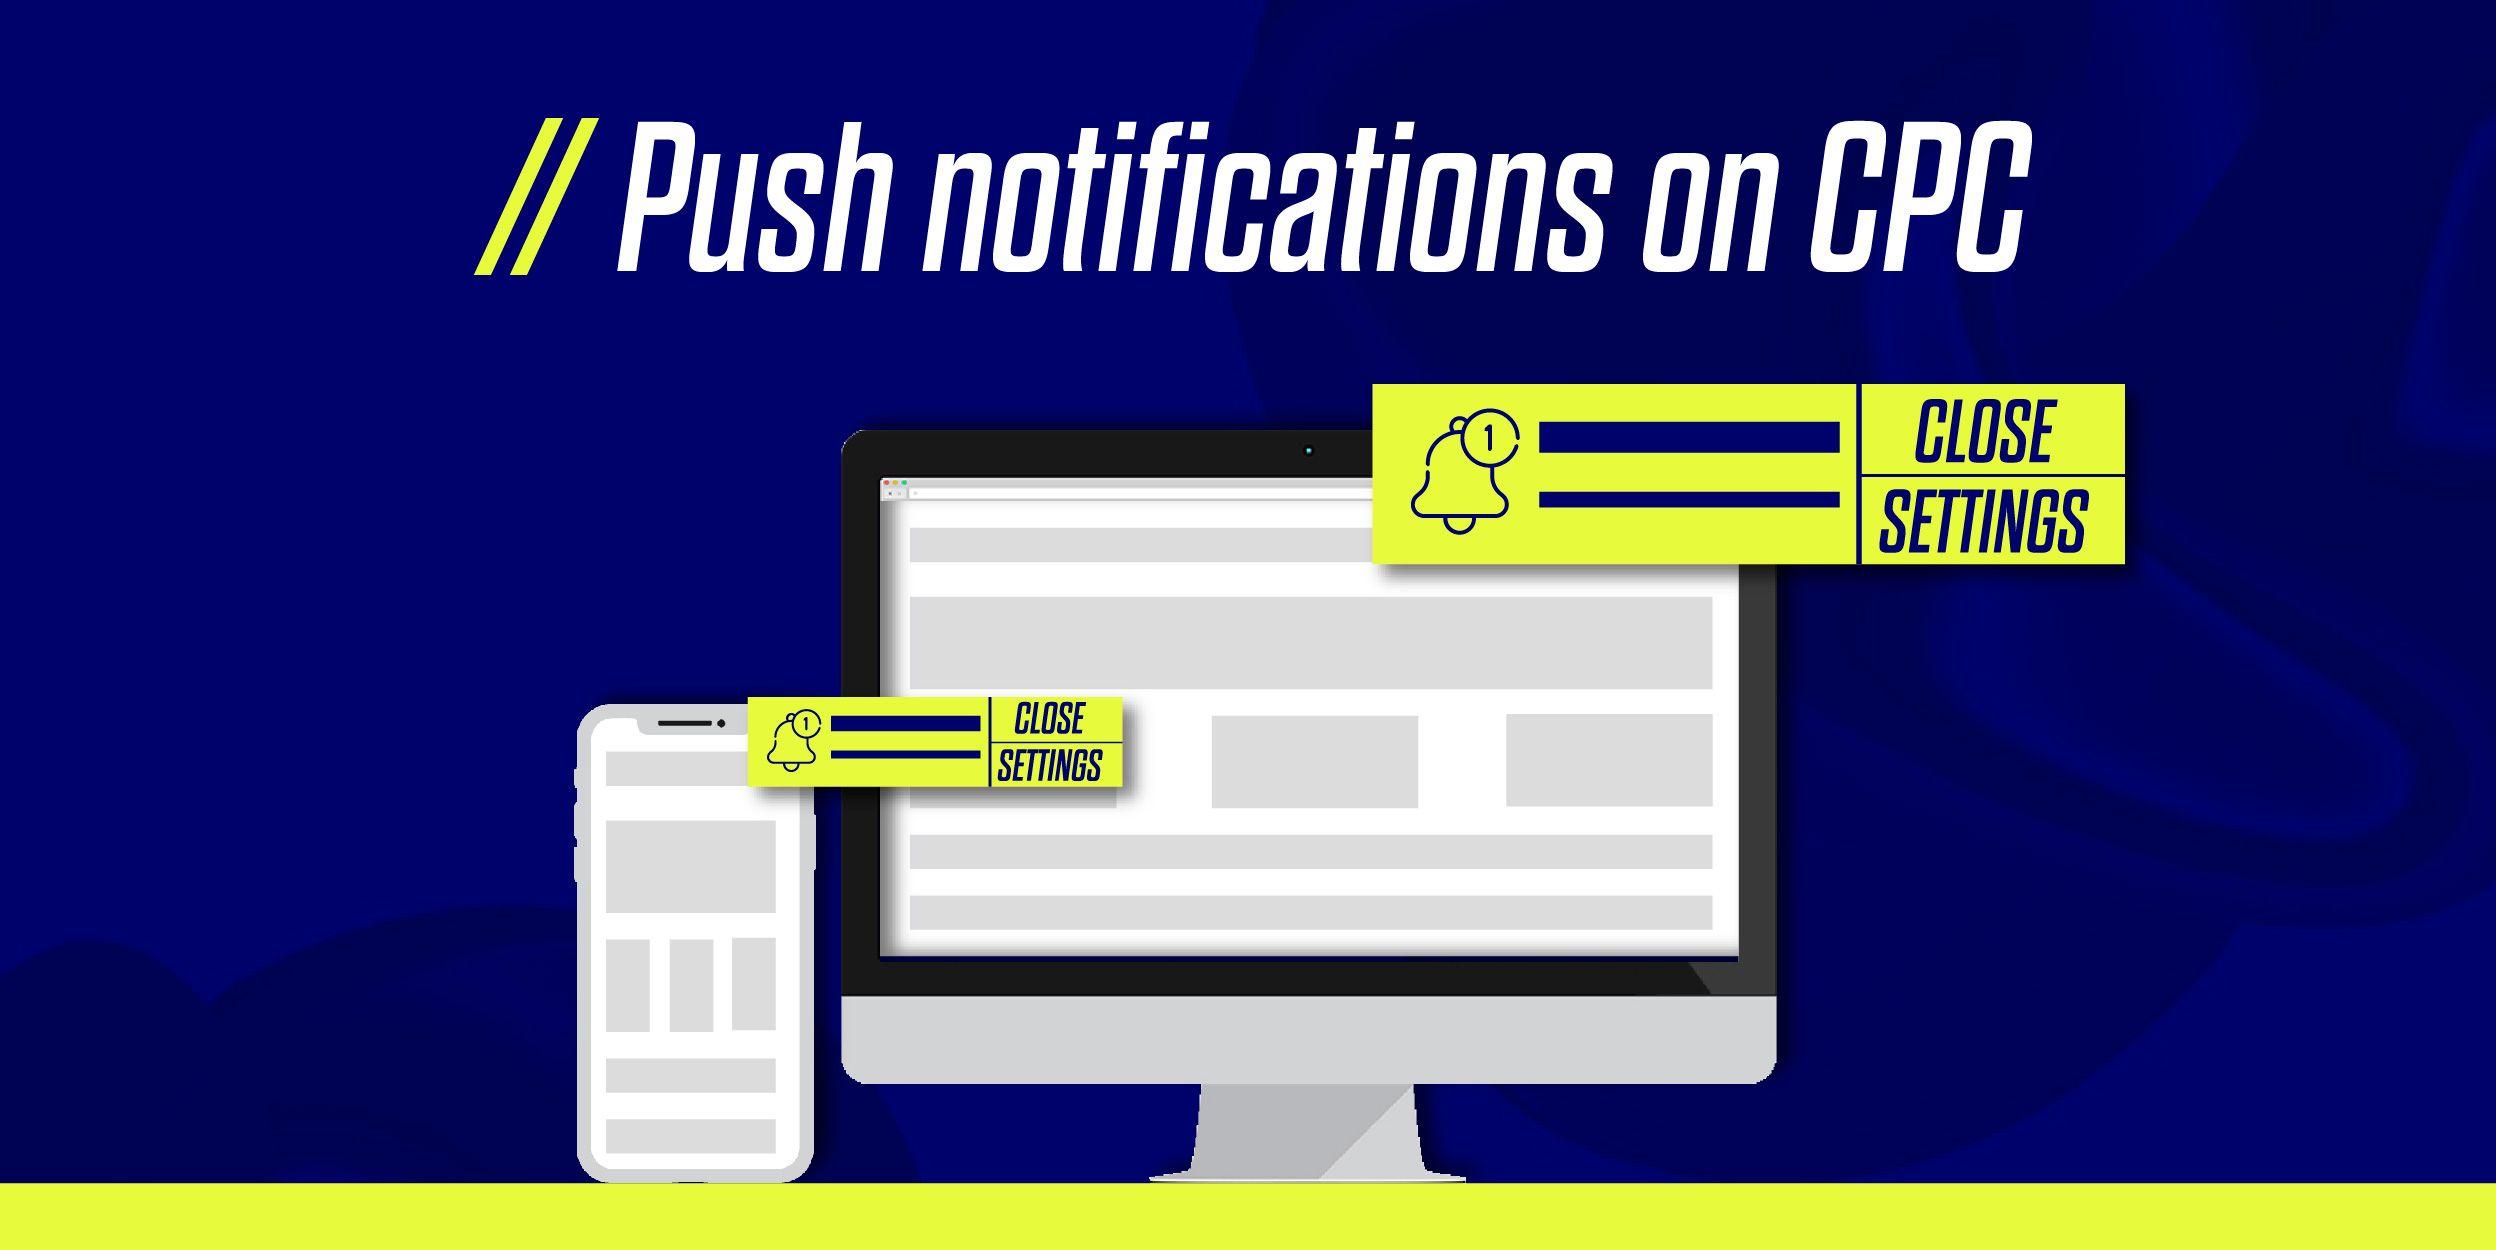 Push notification on CPC